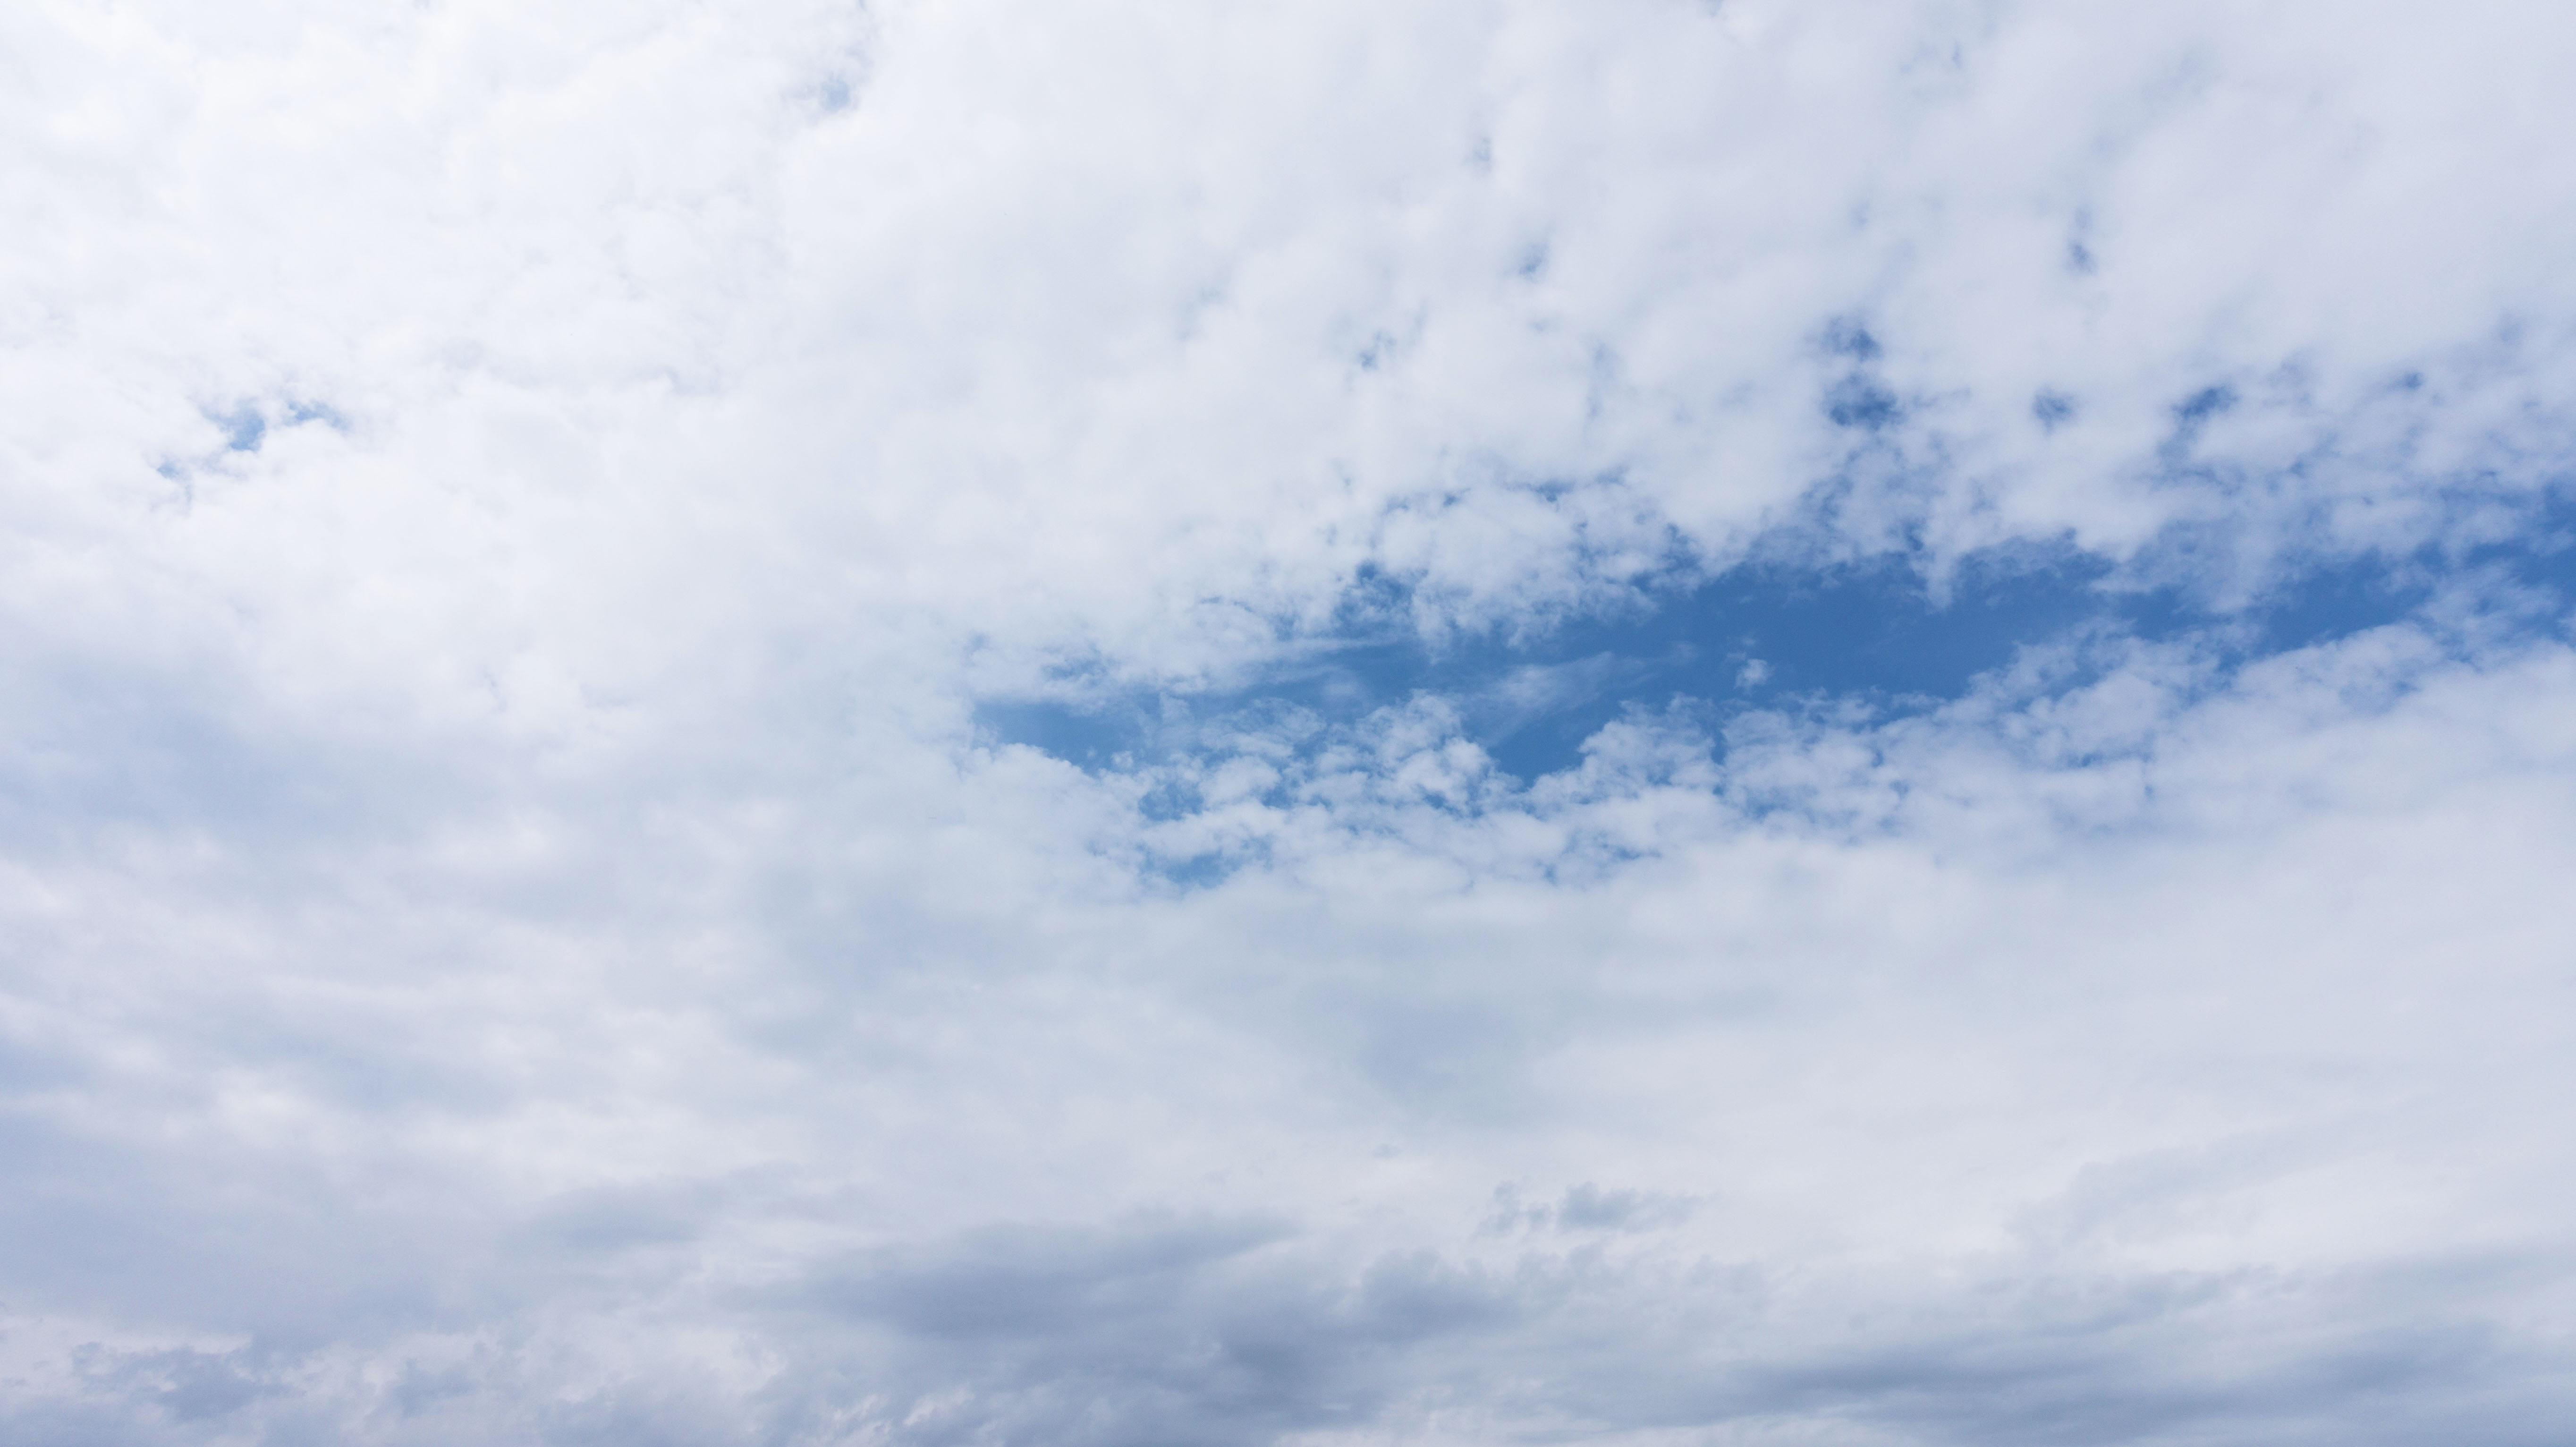 Hdri sky 015 hdri skies sky background 4 altavistaventures Images